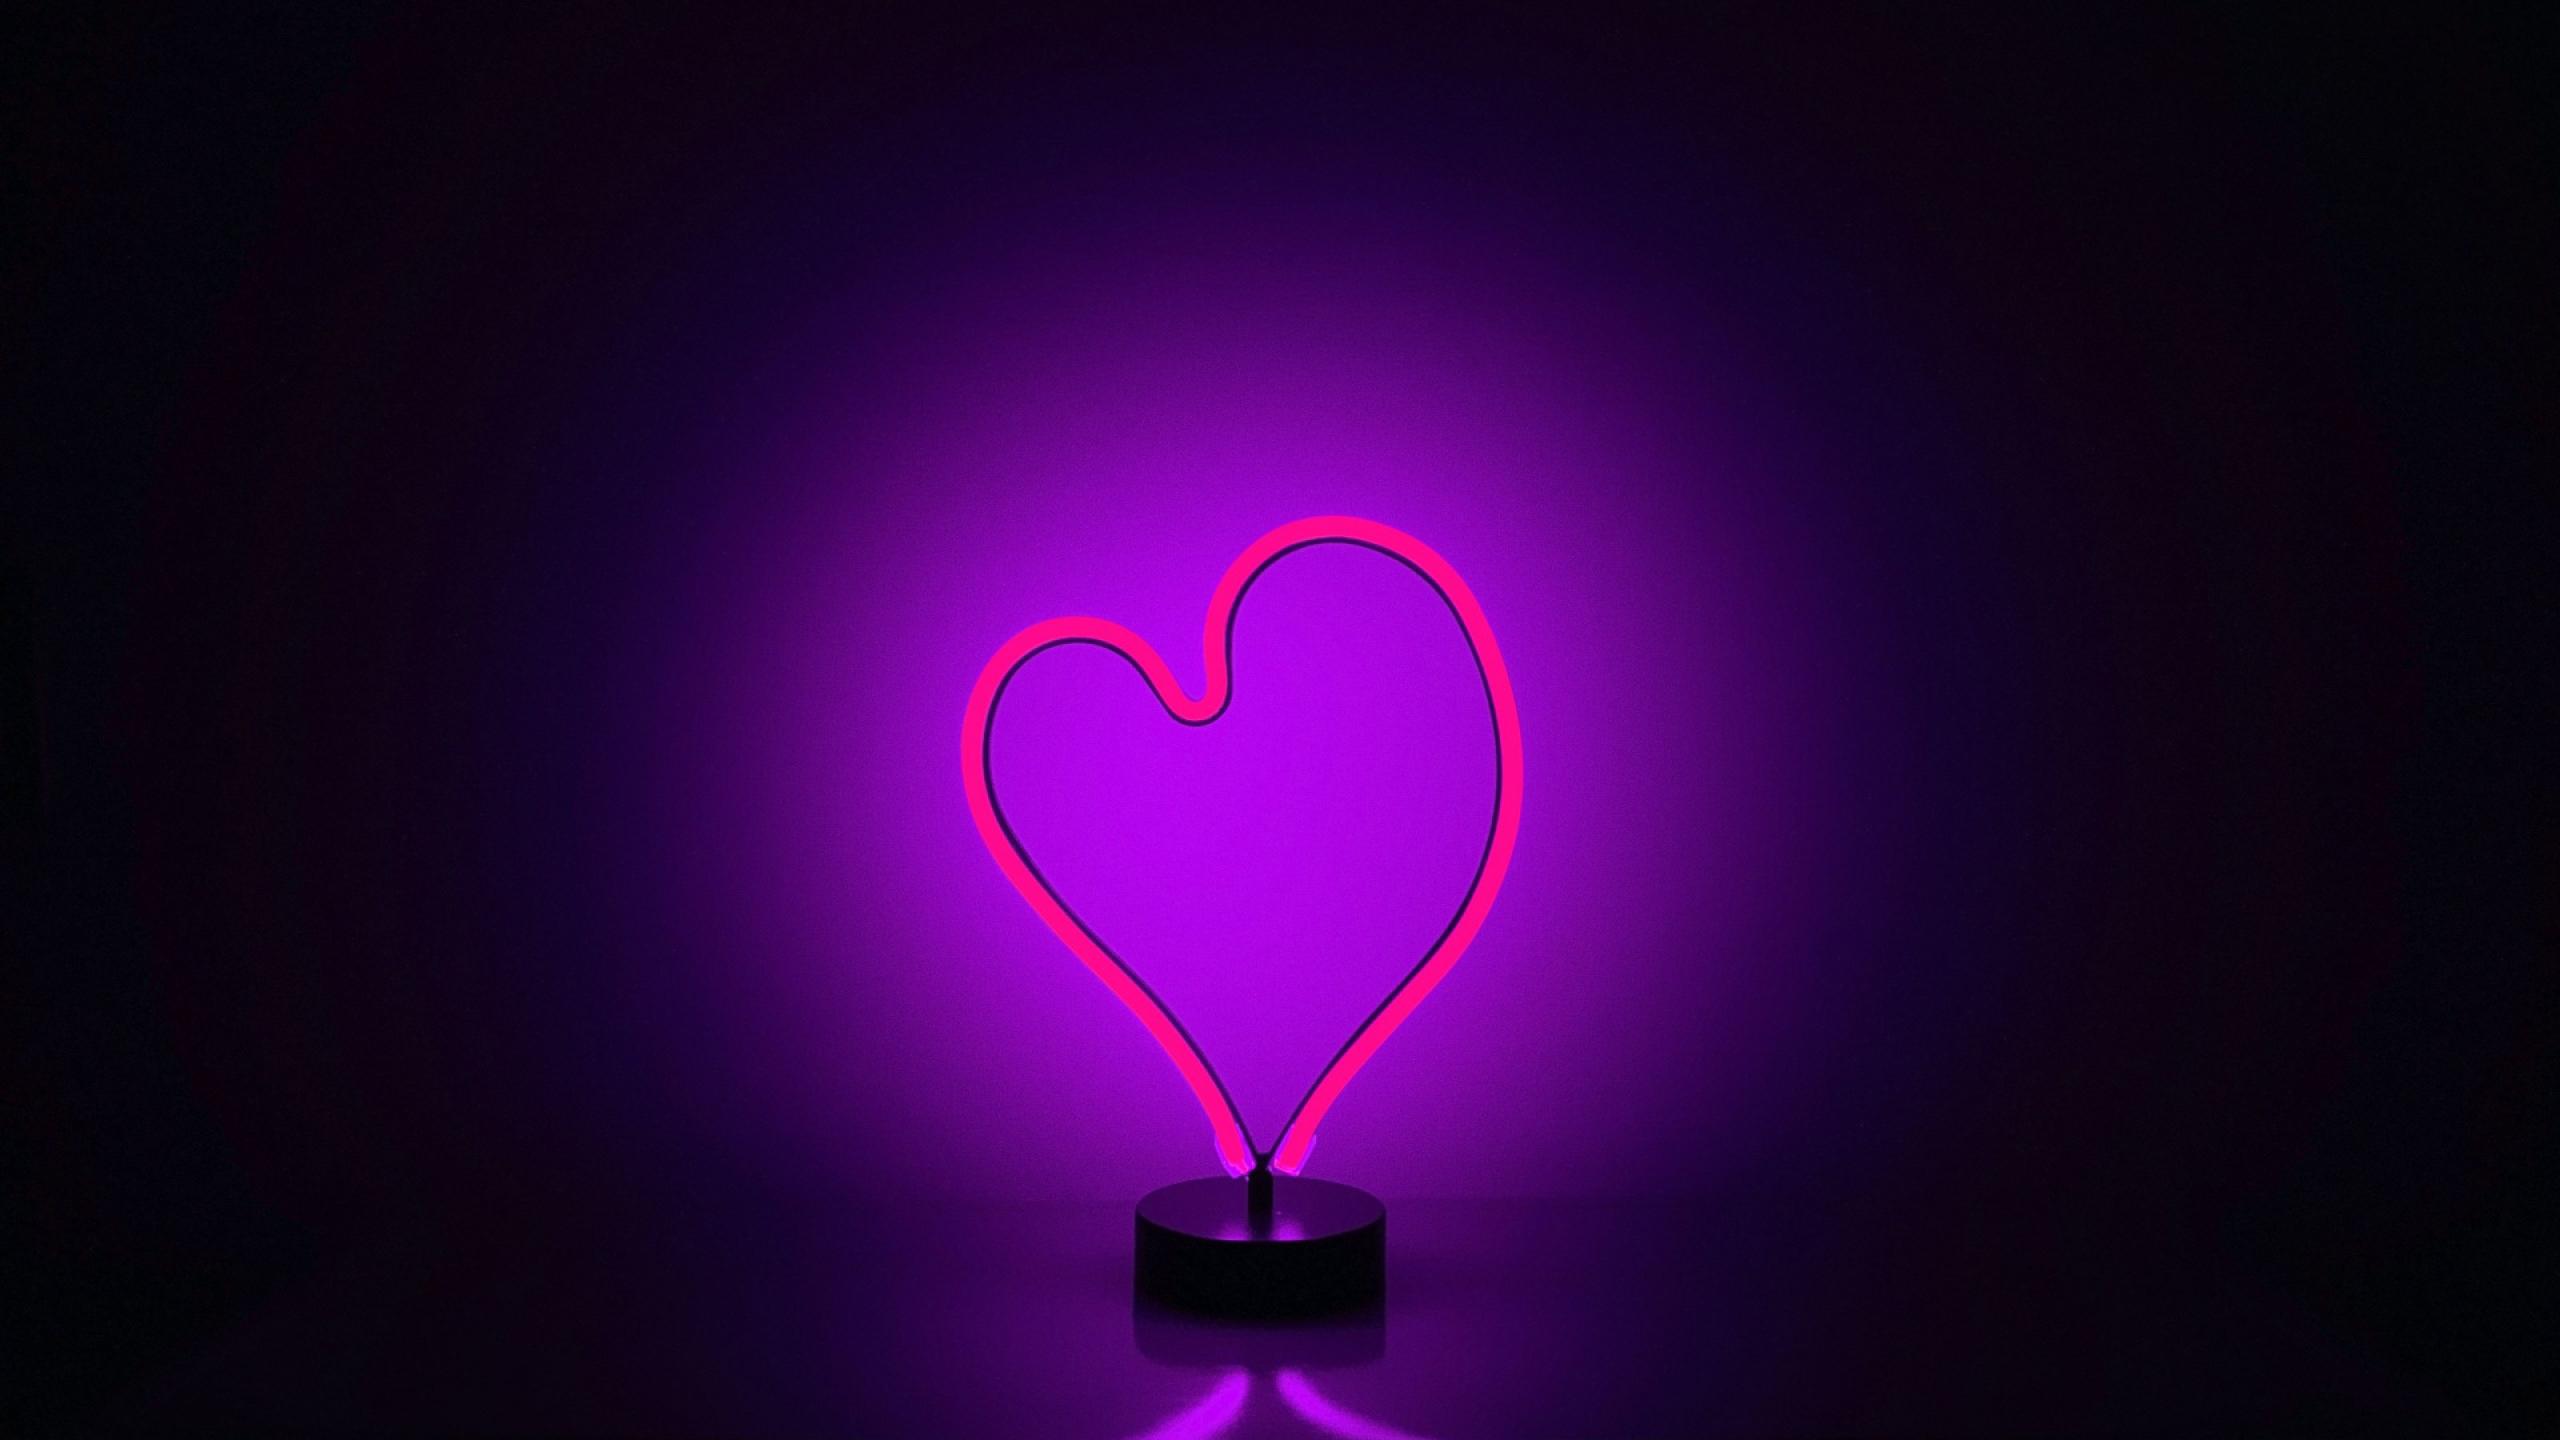 neon light heart full hd wallpaper